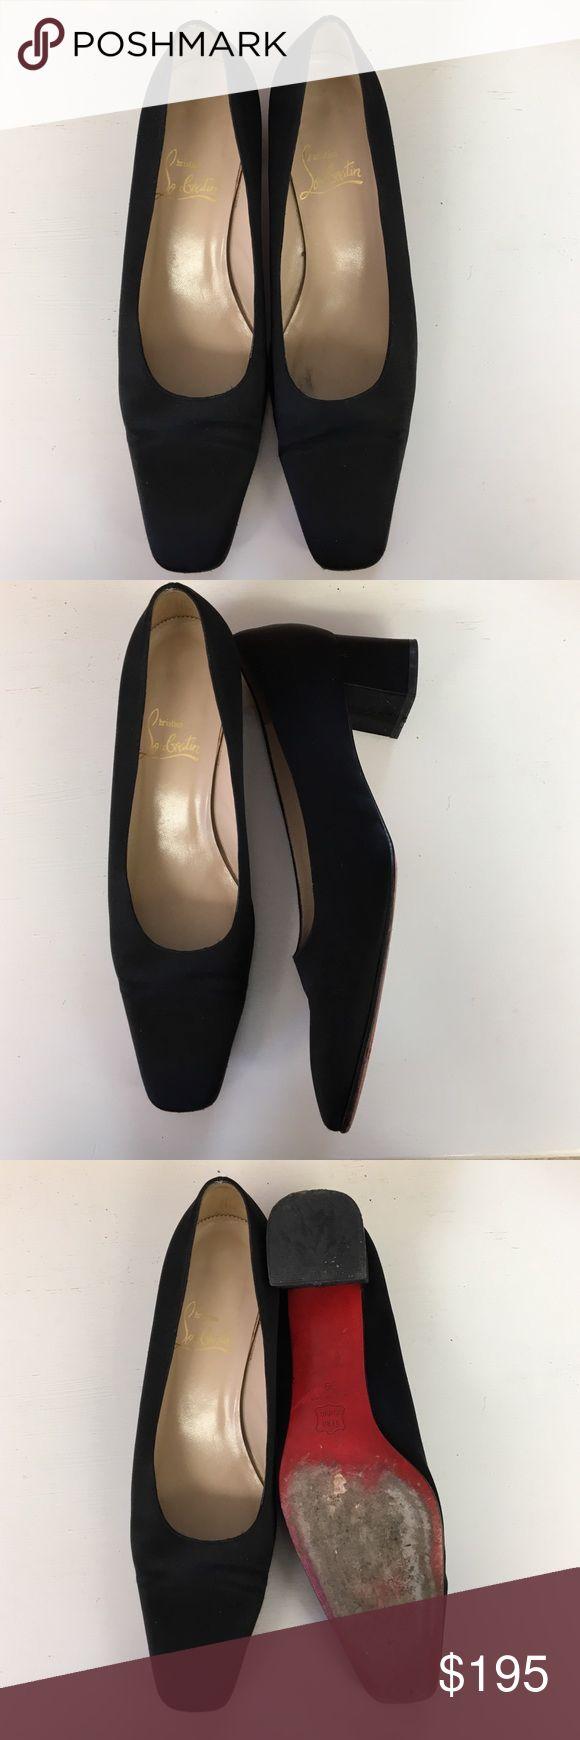 Black louboutins Chunky low heel Christian Louboutin Shoes